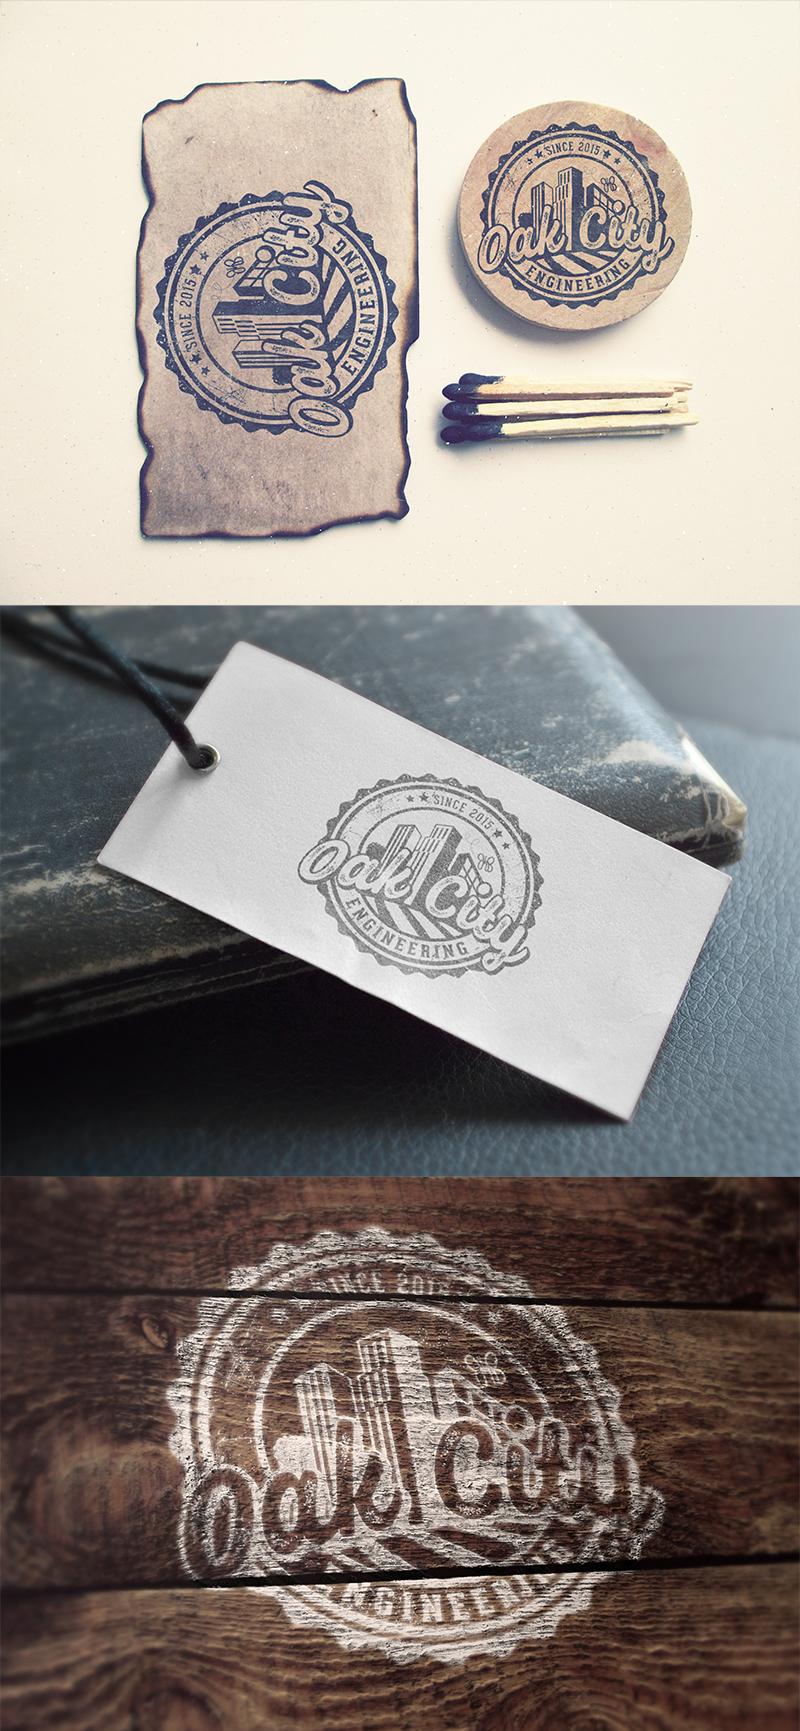 00263_oce_logo_branding_mockup_final